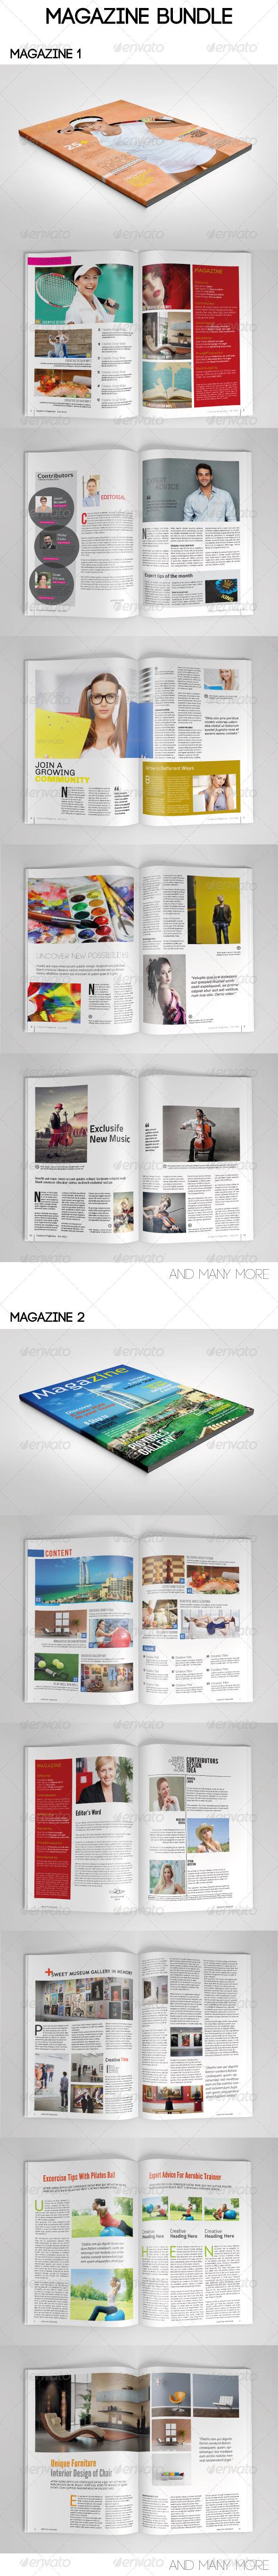 GraphicRiver Magazine Bundle Template 7815270